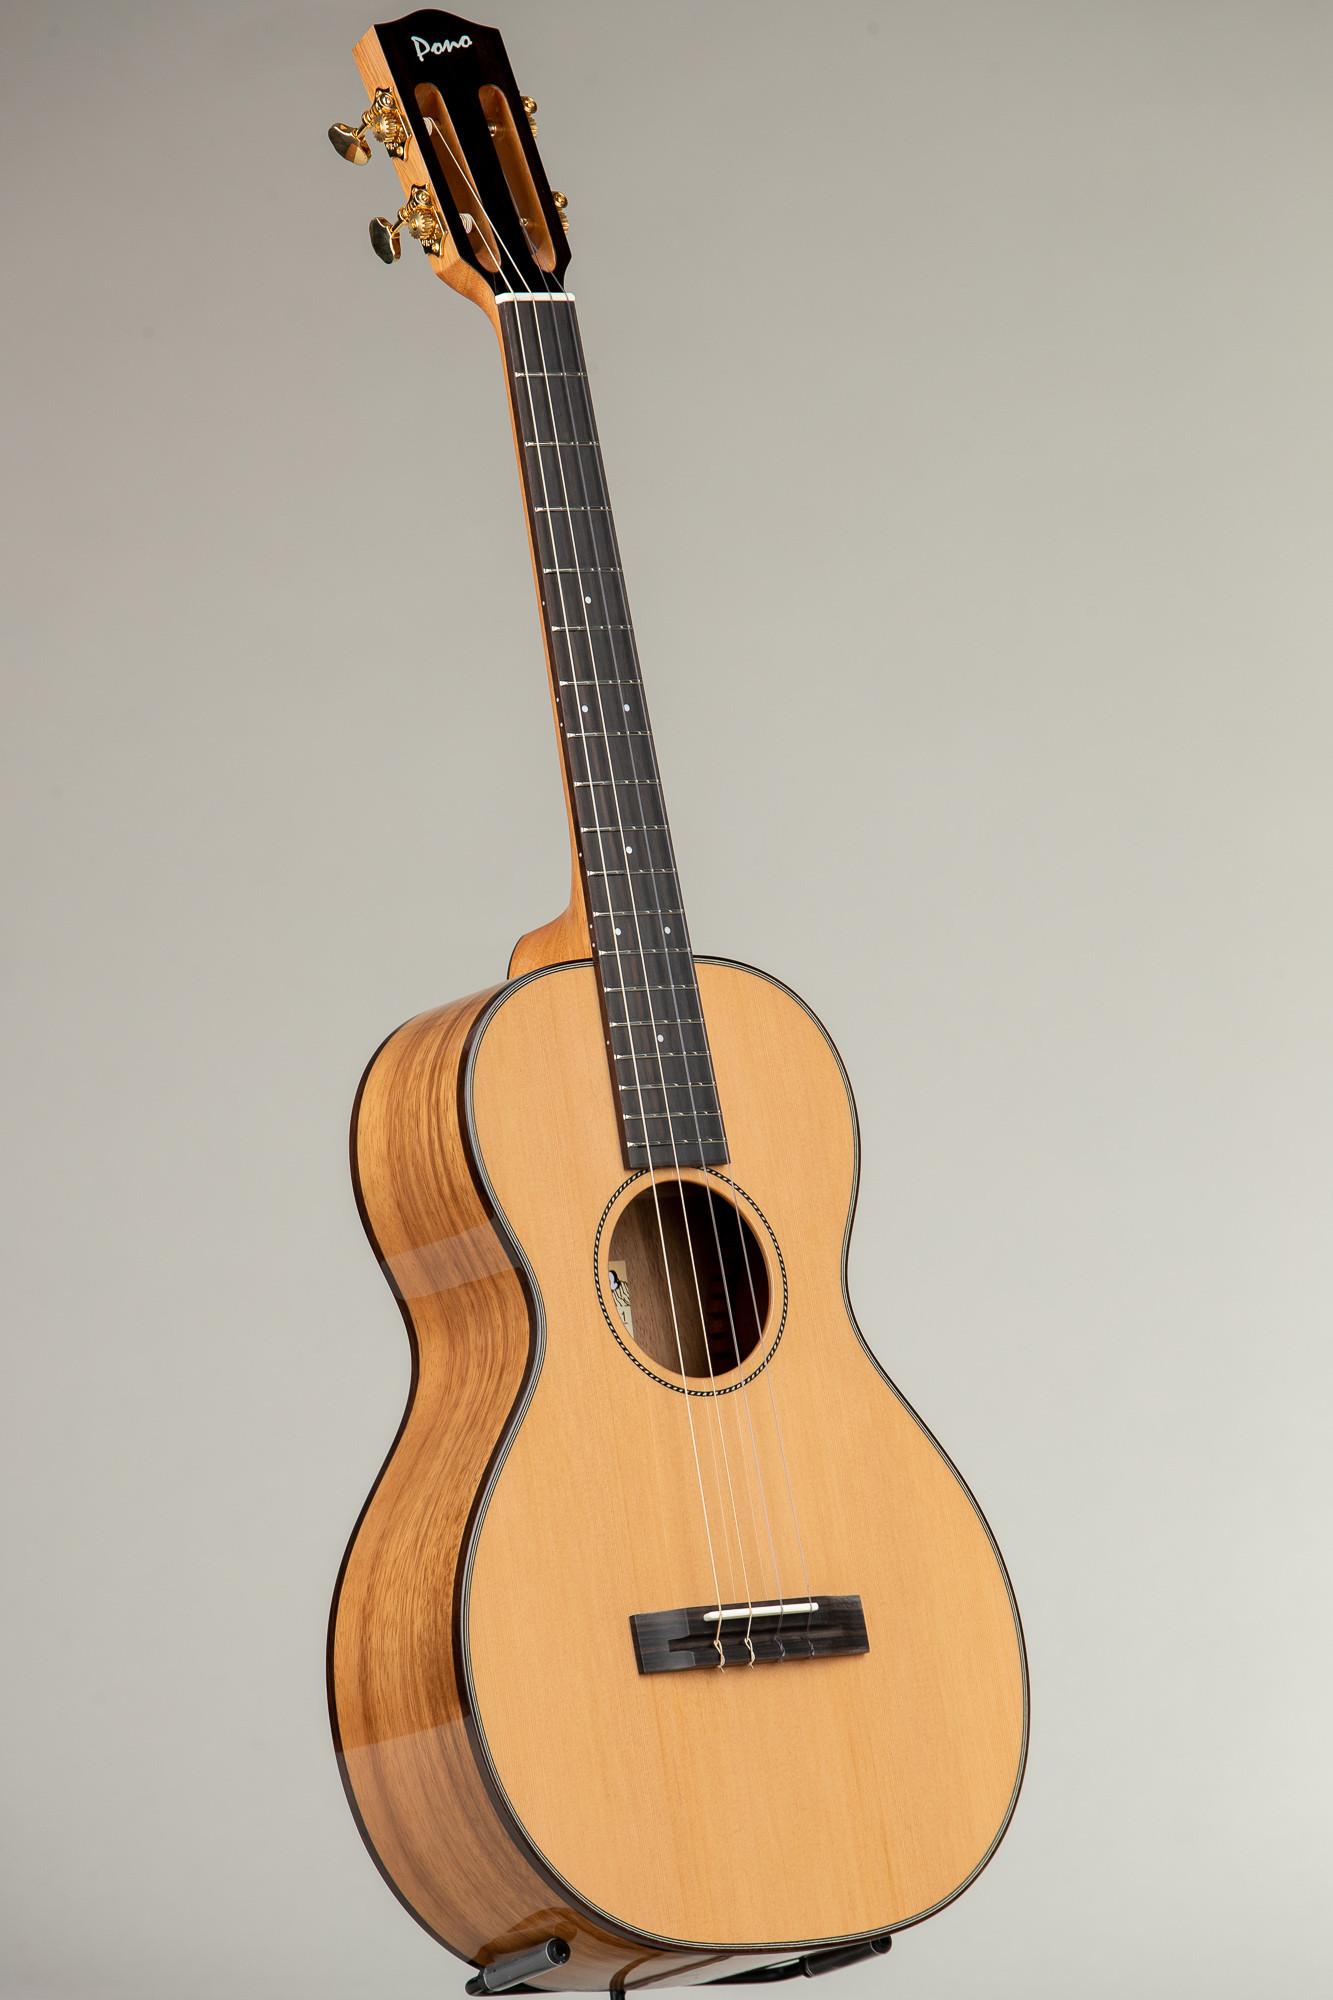 Pono Cedar Top Acacia UL Baritone (UL4N-1 3211)